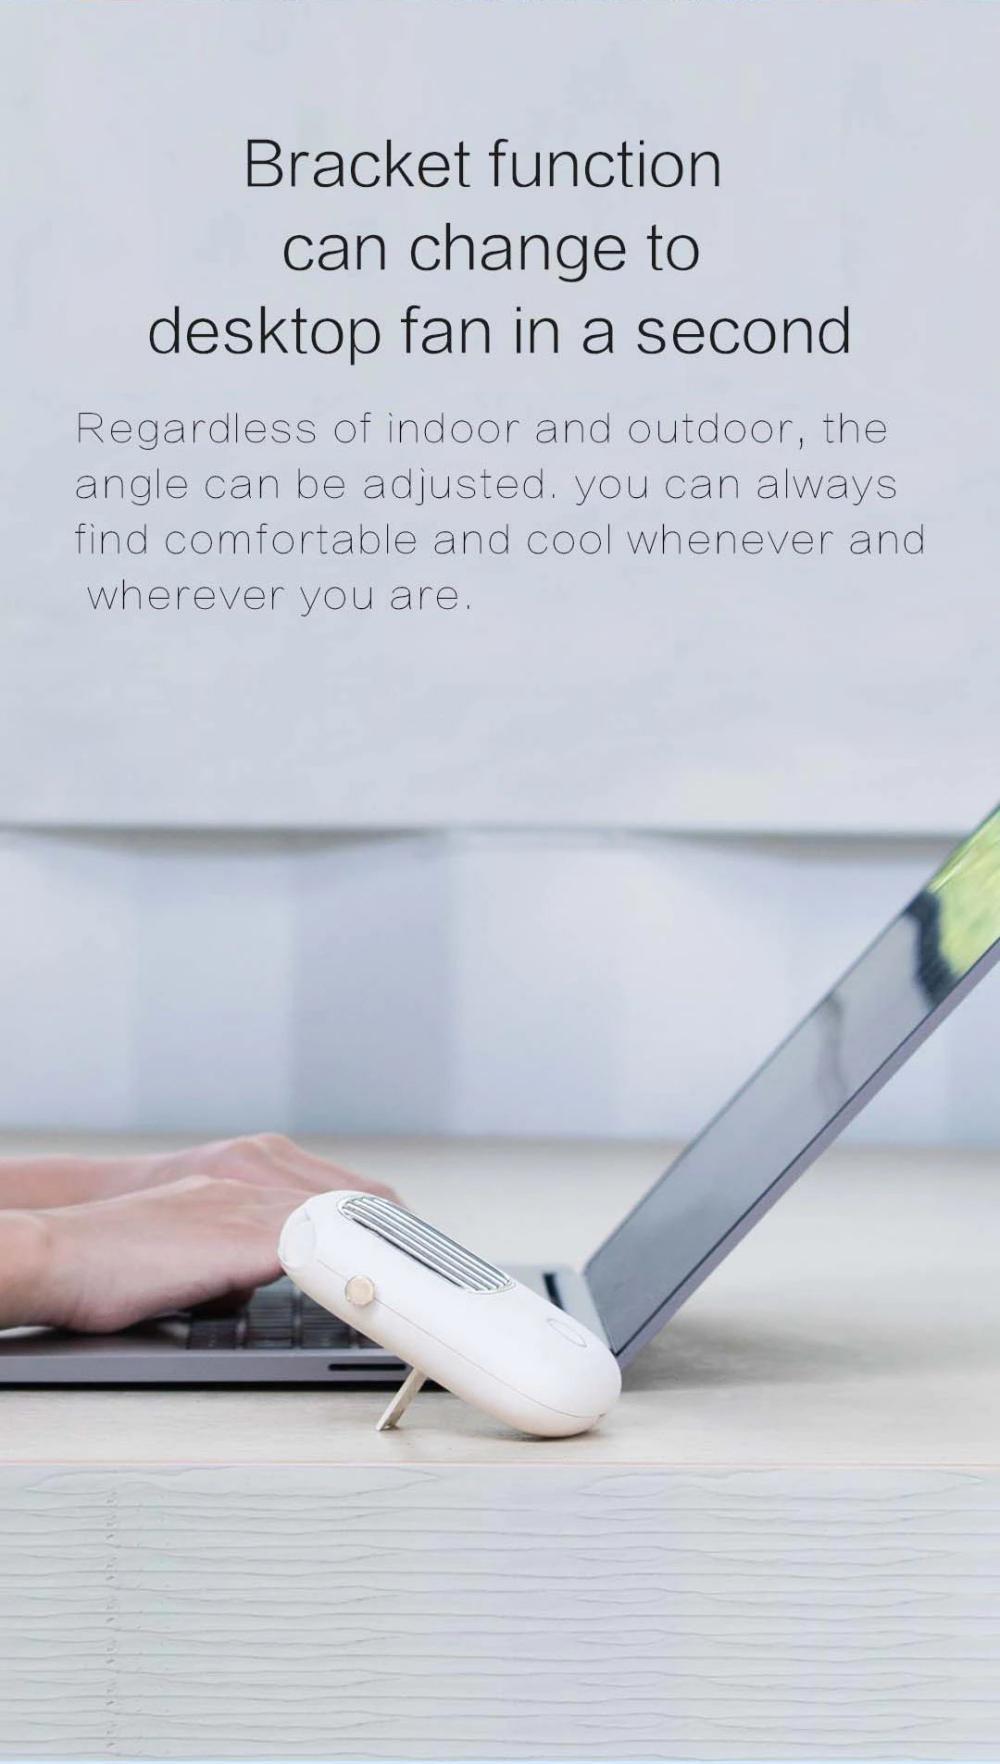 Xiaomi Portable Hanging Neck Fan Mini Pocket Air Cooling Fan (5)